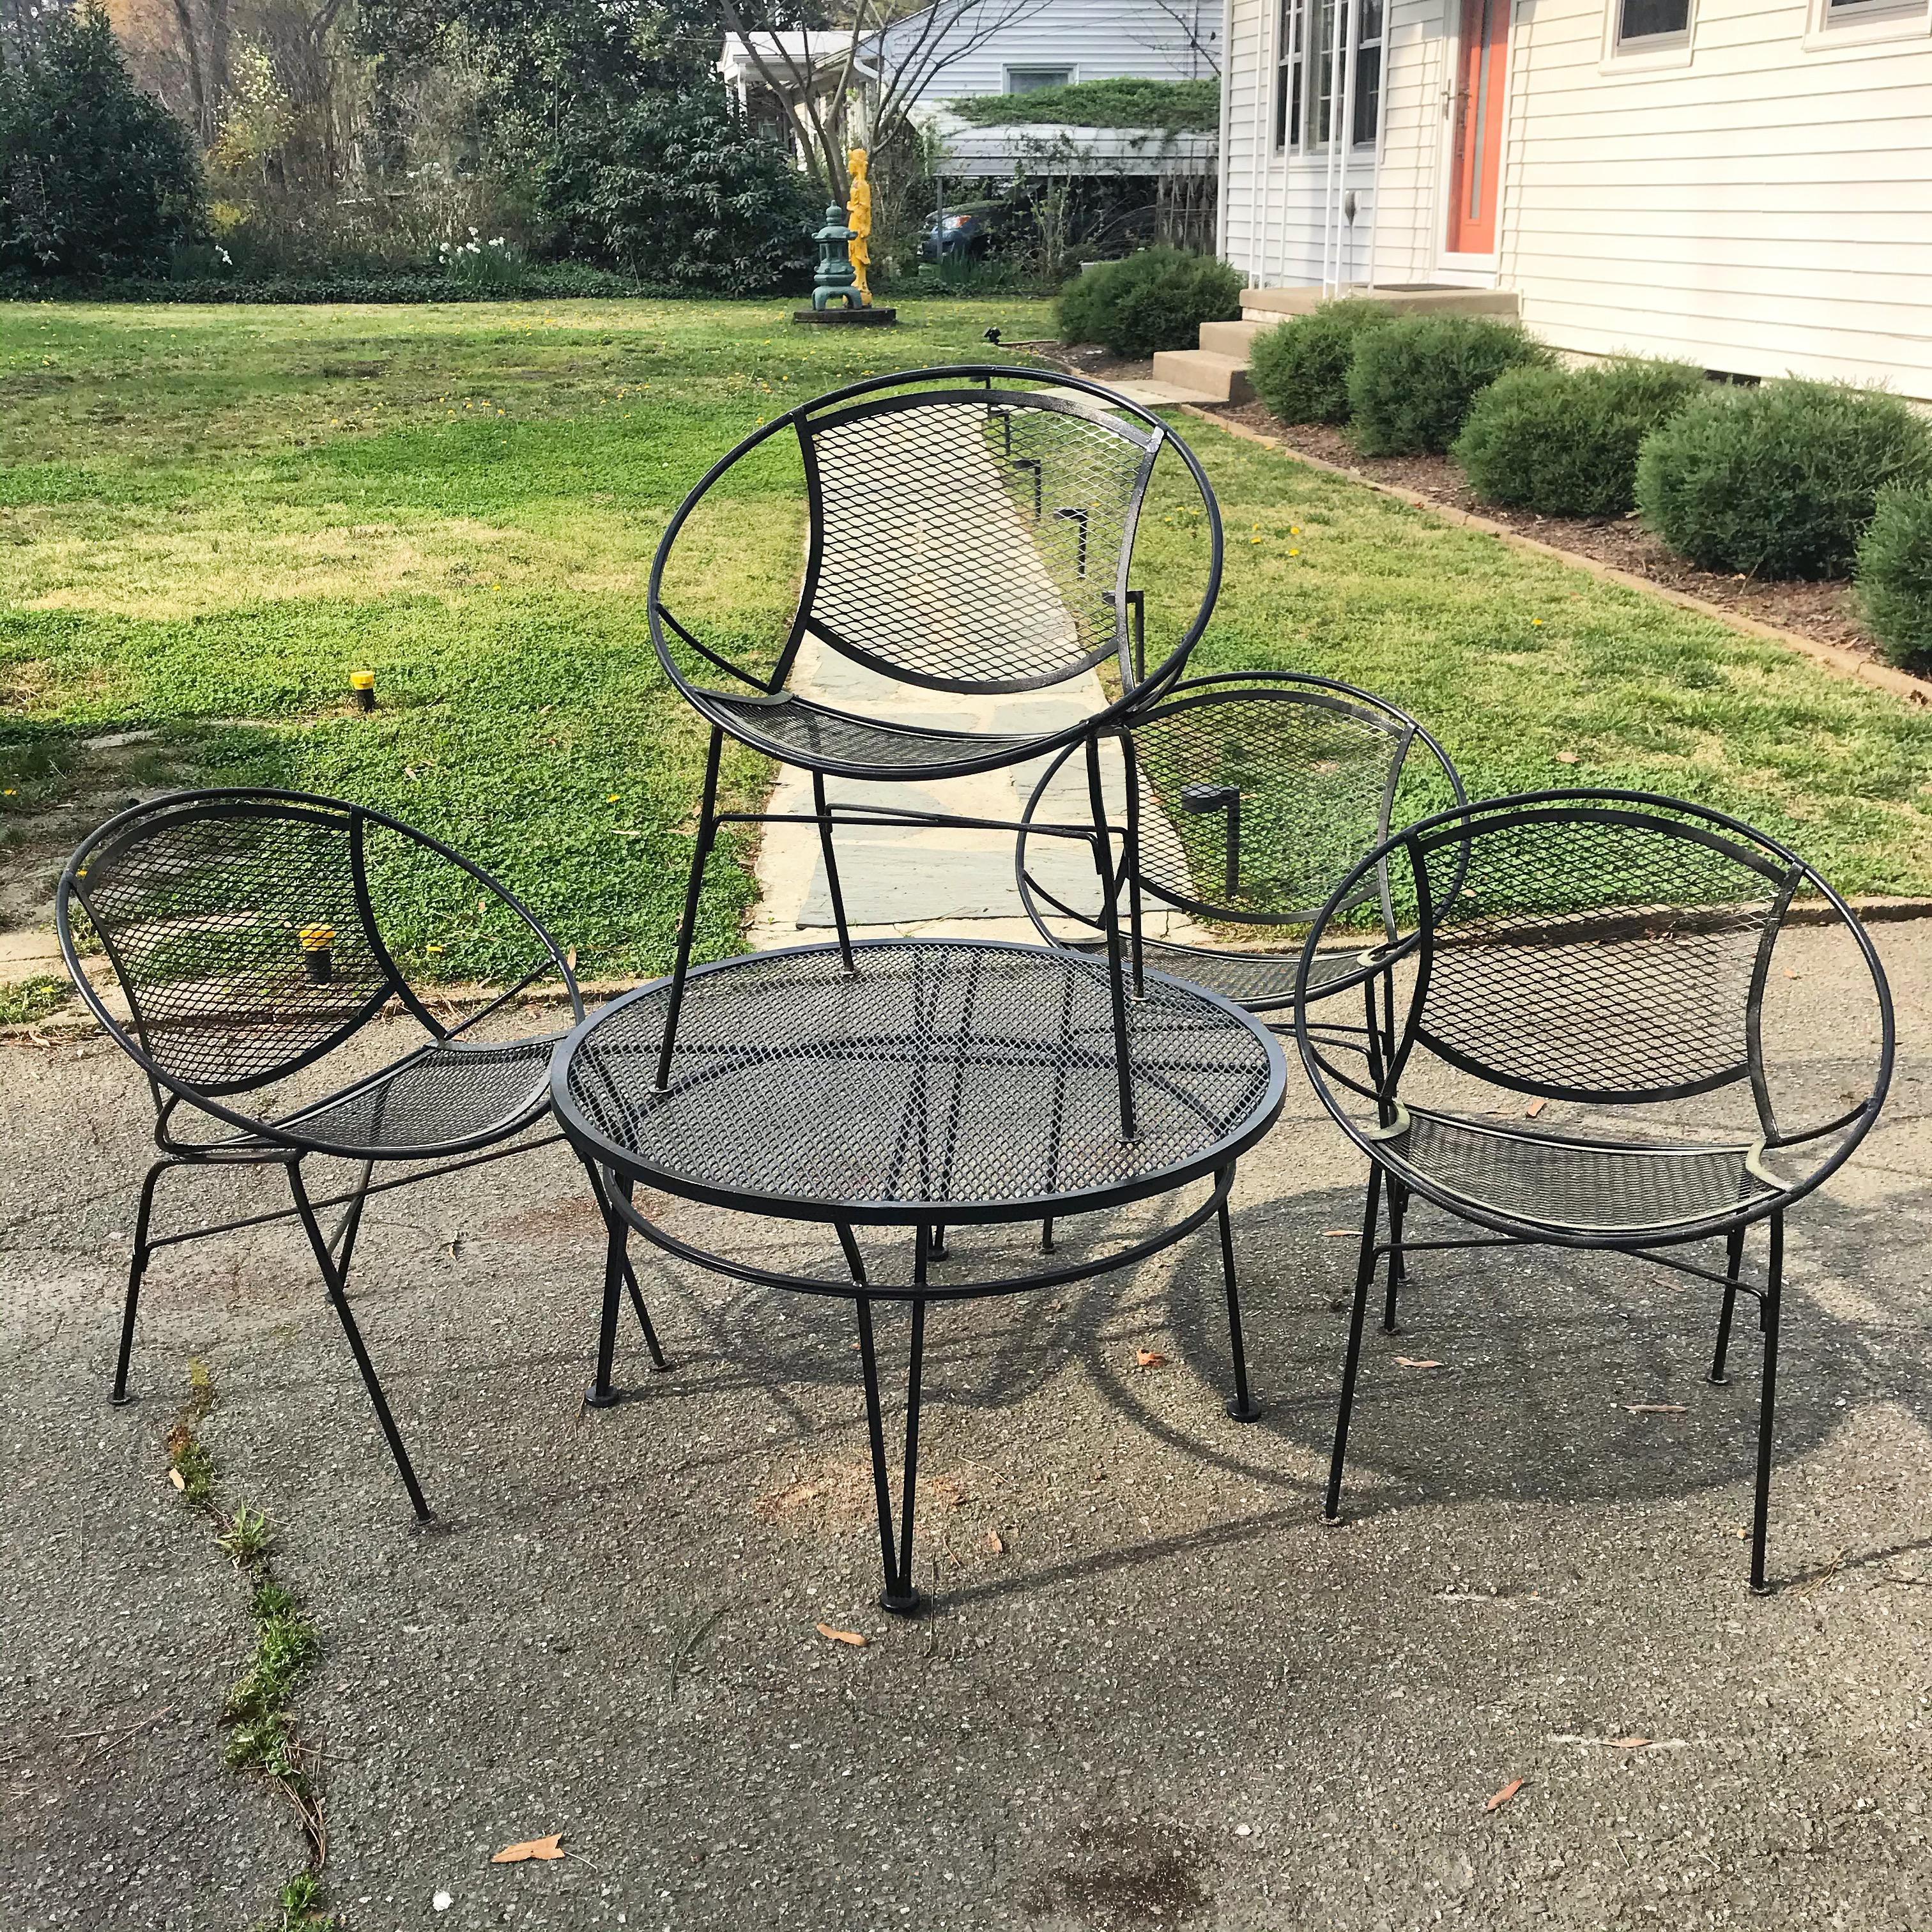 salterini patio set 5 pieces